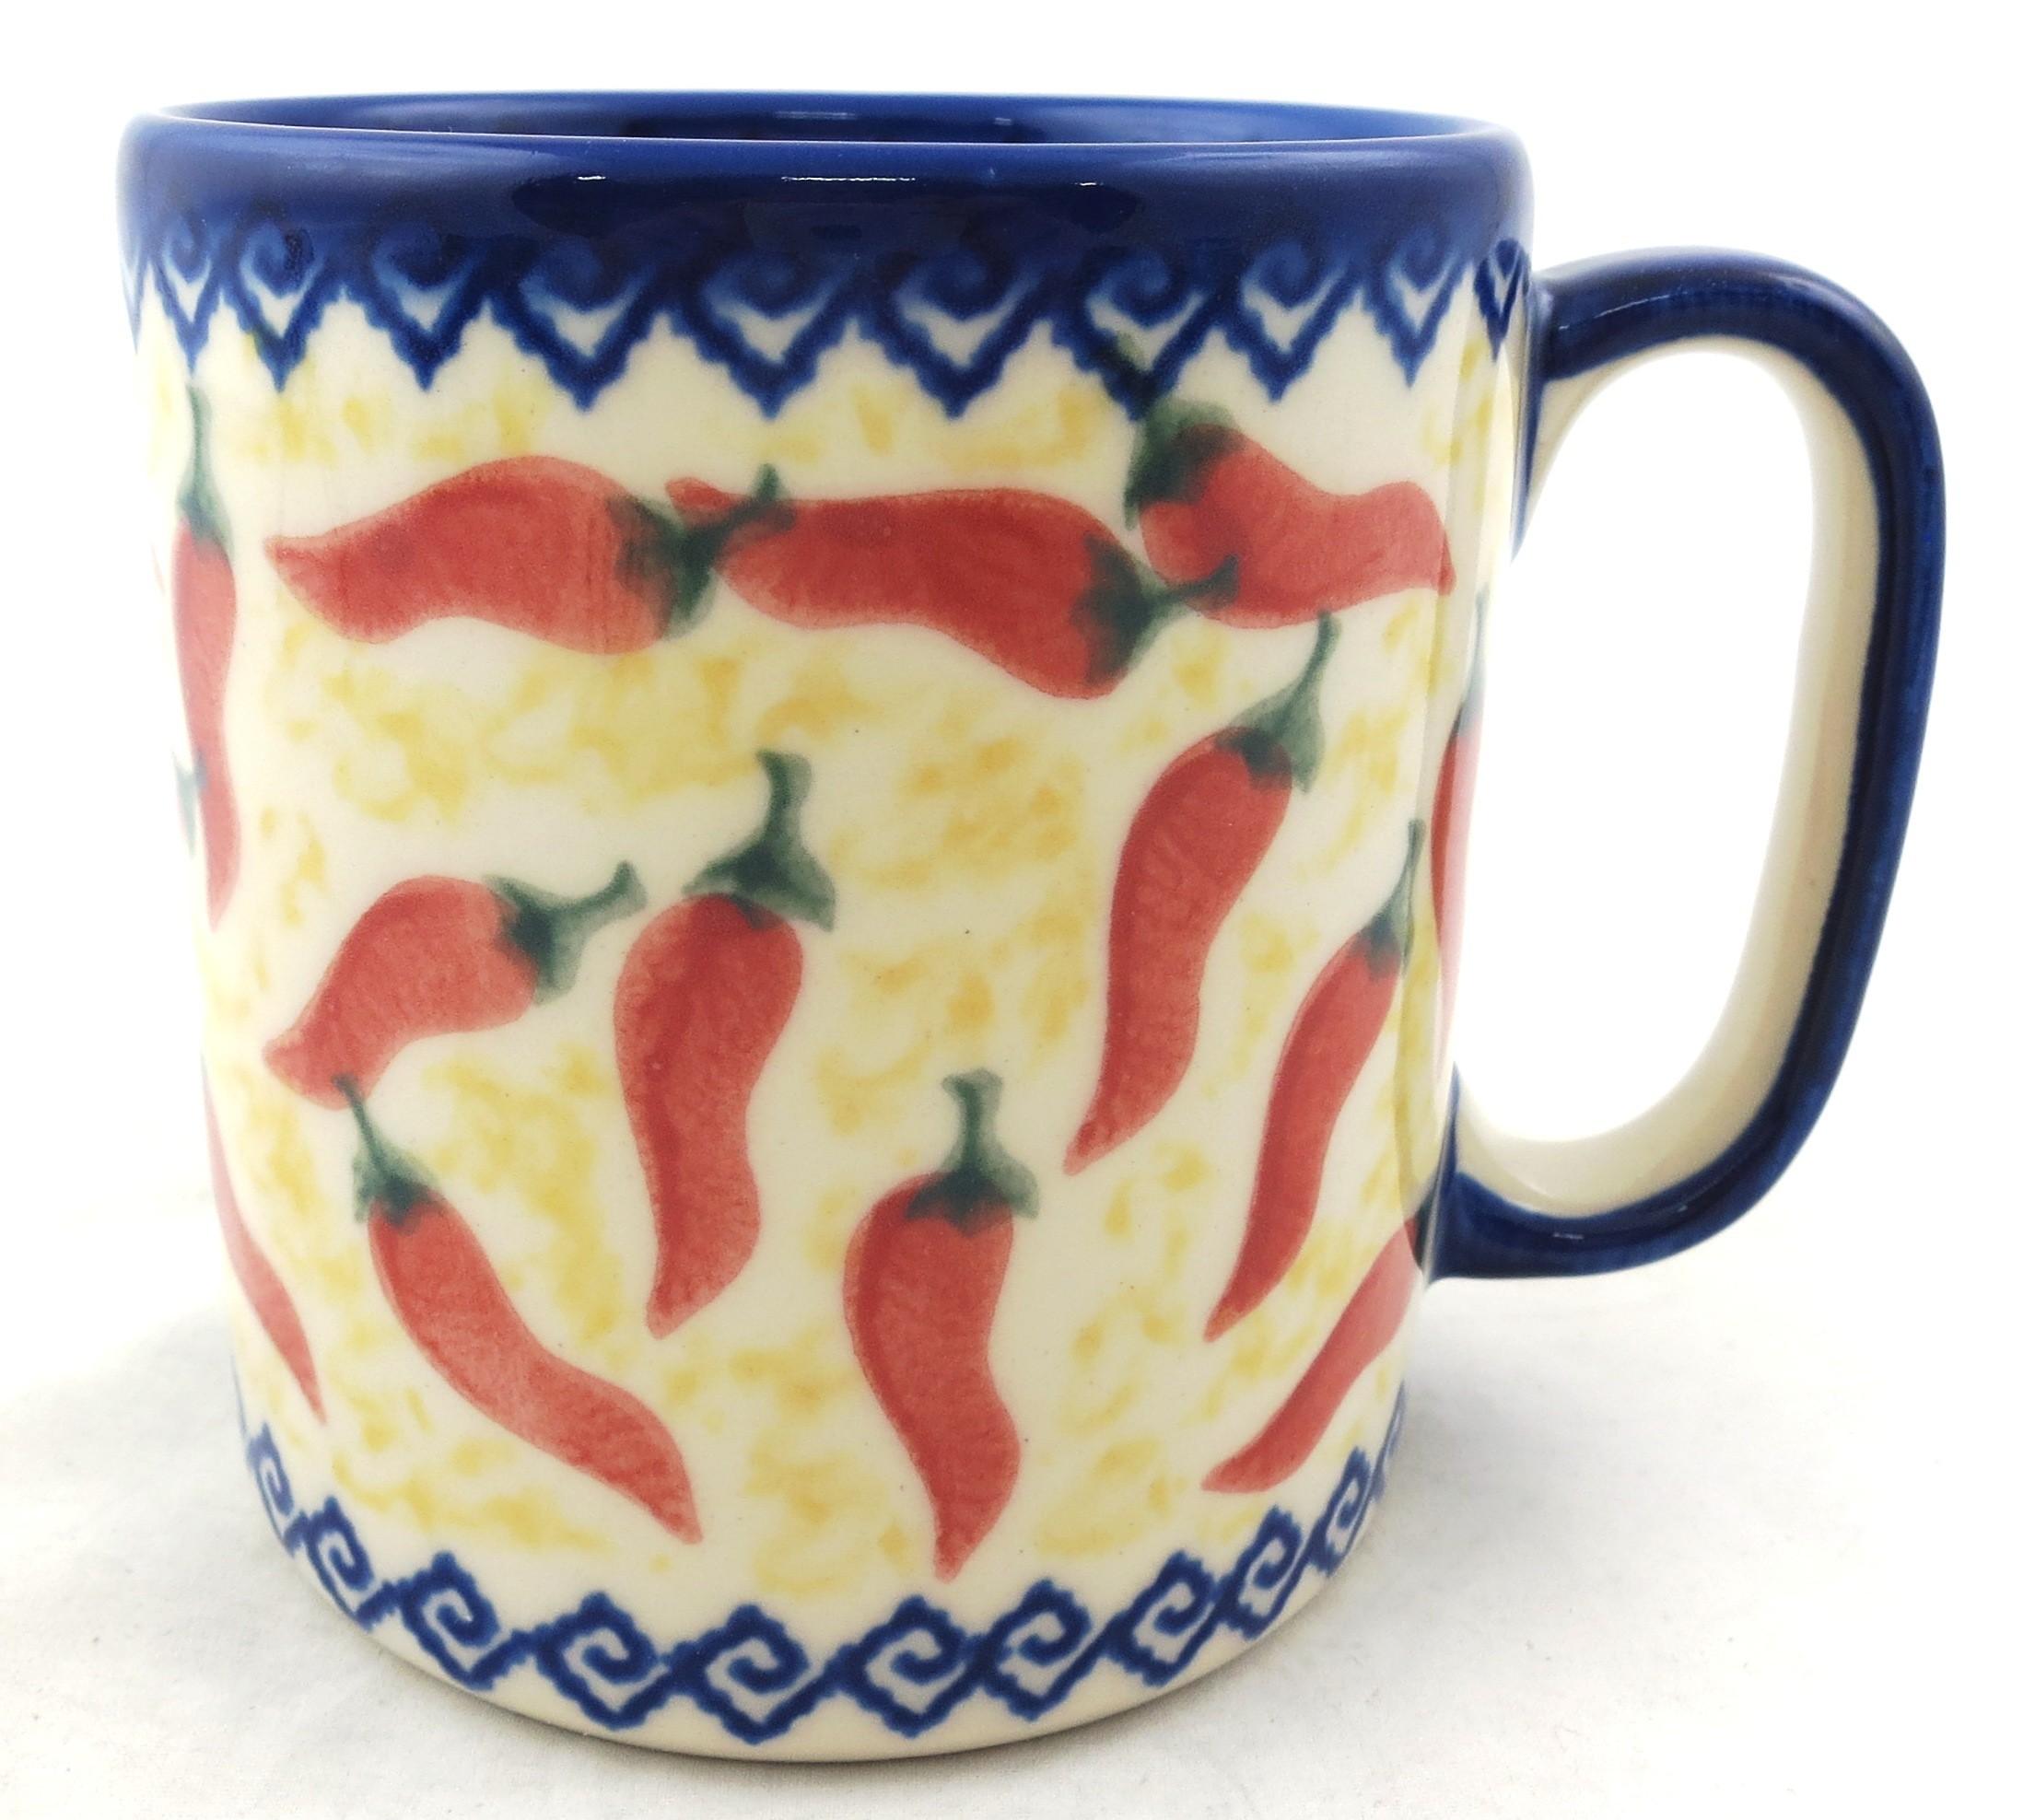 Pottery Avenue 12-oz RED HOT Stoneware Coffee Mug | VENA UNIKAT